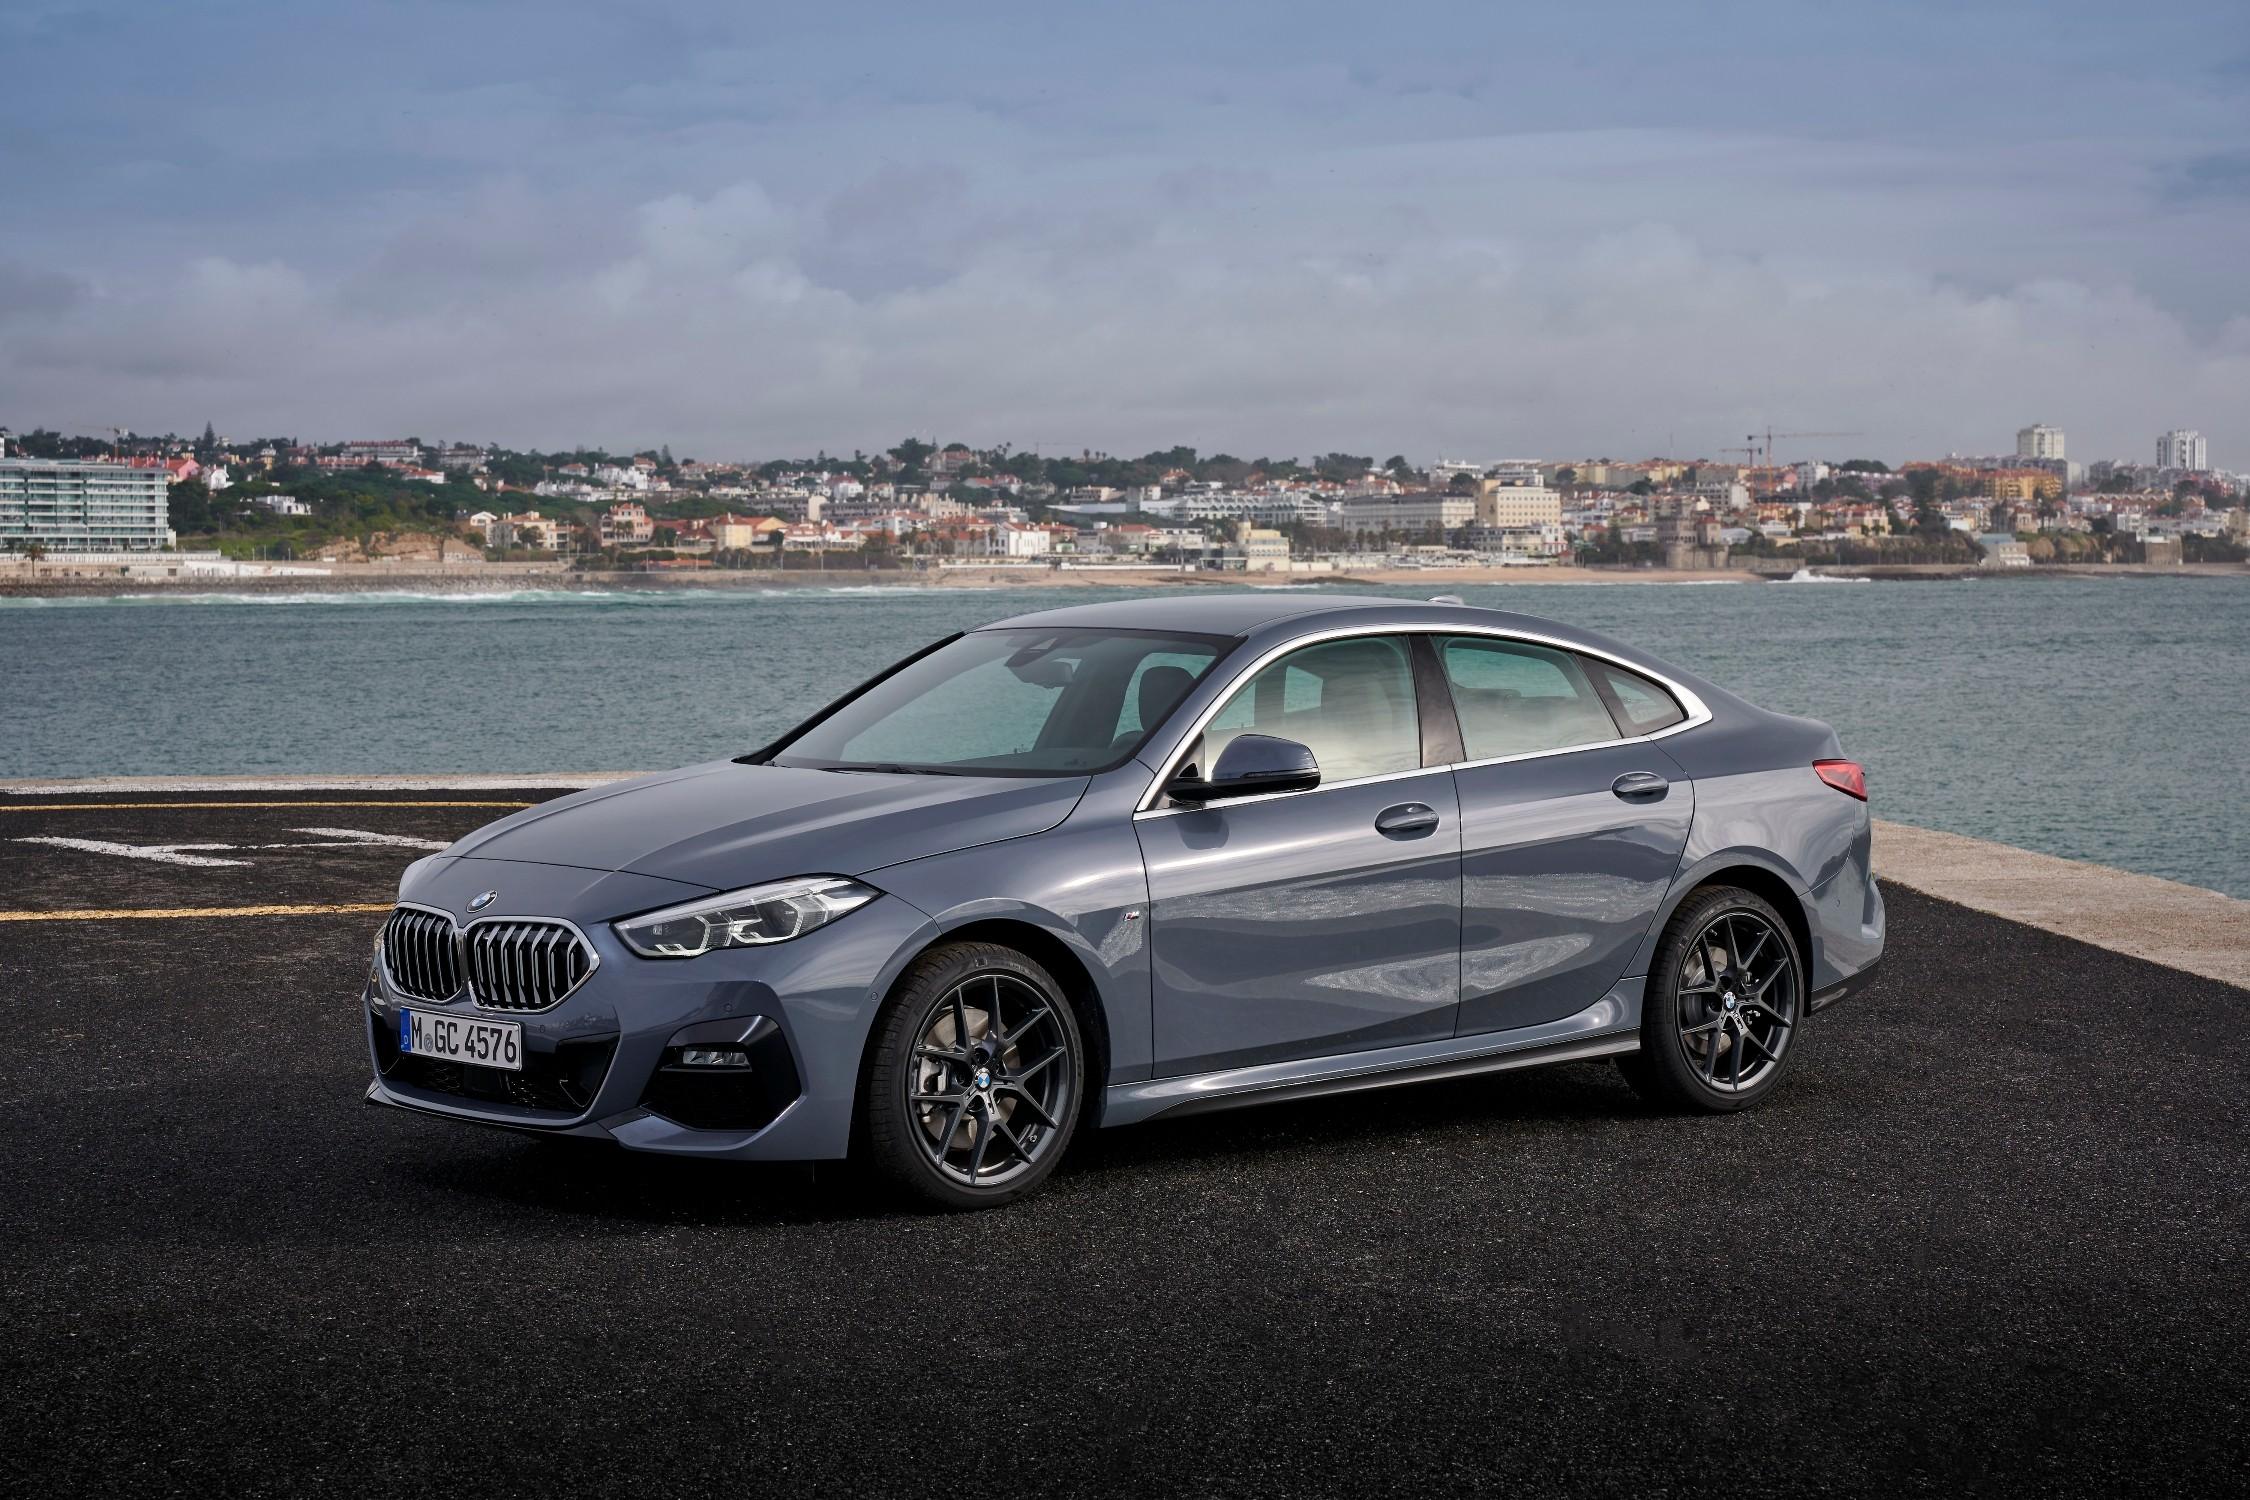 BMW SERIE 2 GRAN COUPE'